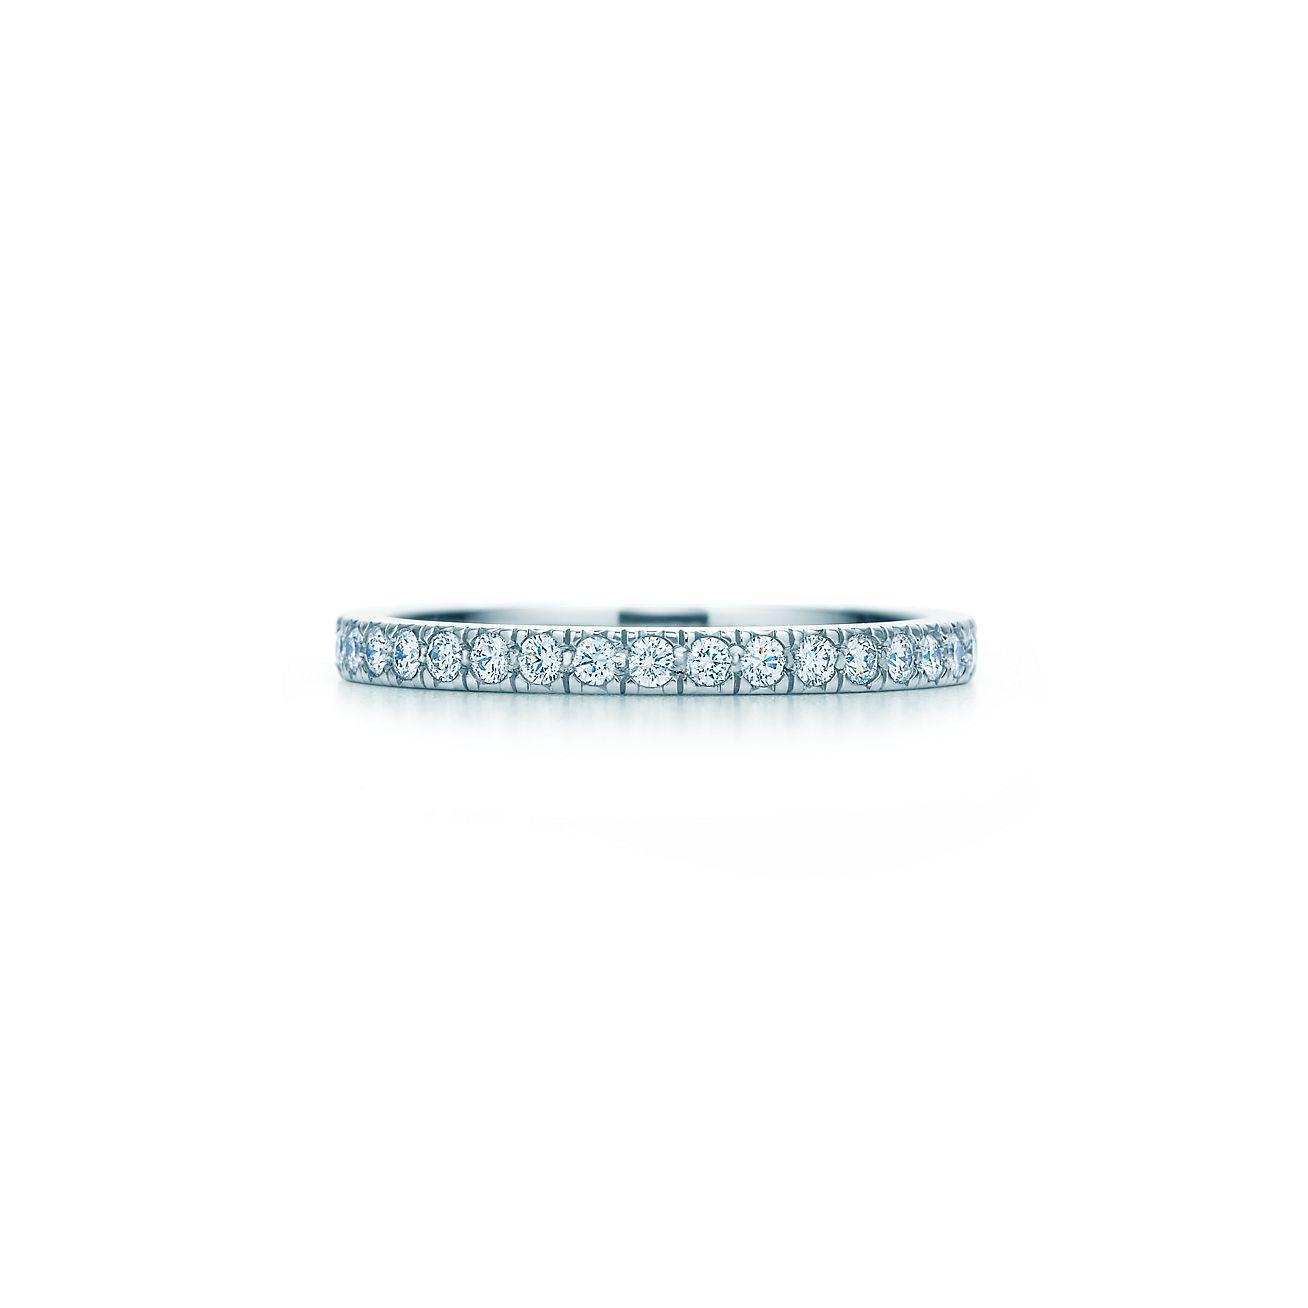 Tiffany Novo Band Ring With Diamonds In Platinum Tiffany Co